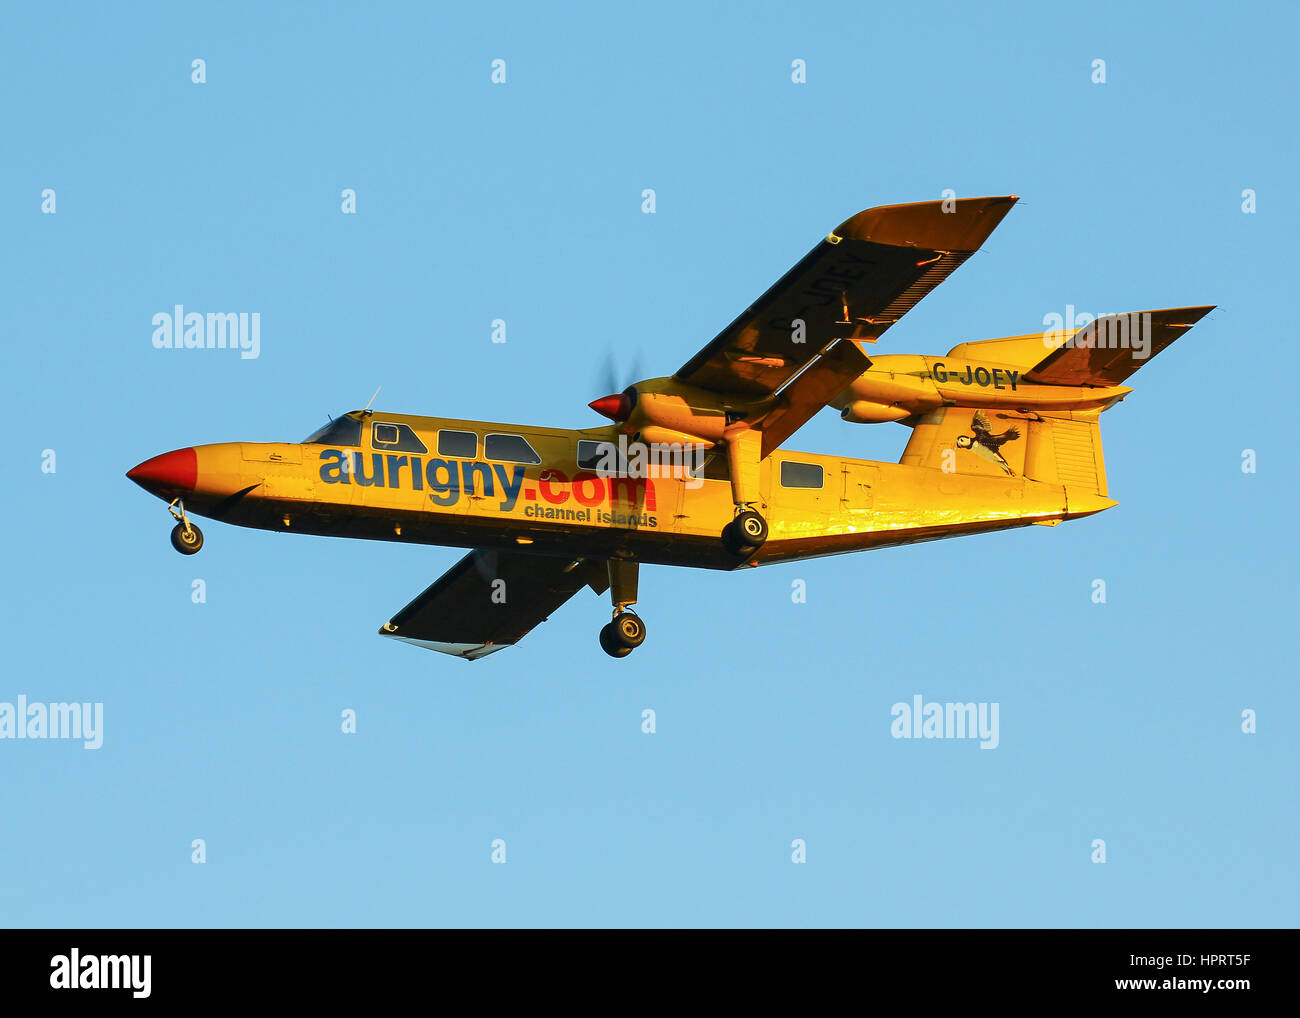 Aurigny Air Services Britten-Norman BN-2A Trislander G-JOEY landing at Southampton Airport - Stock Image